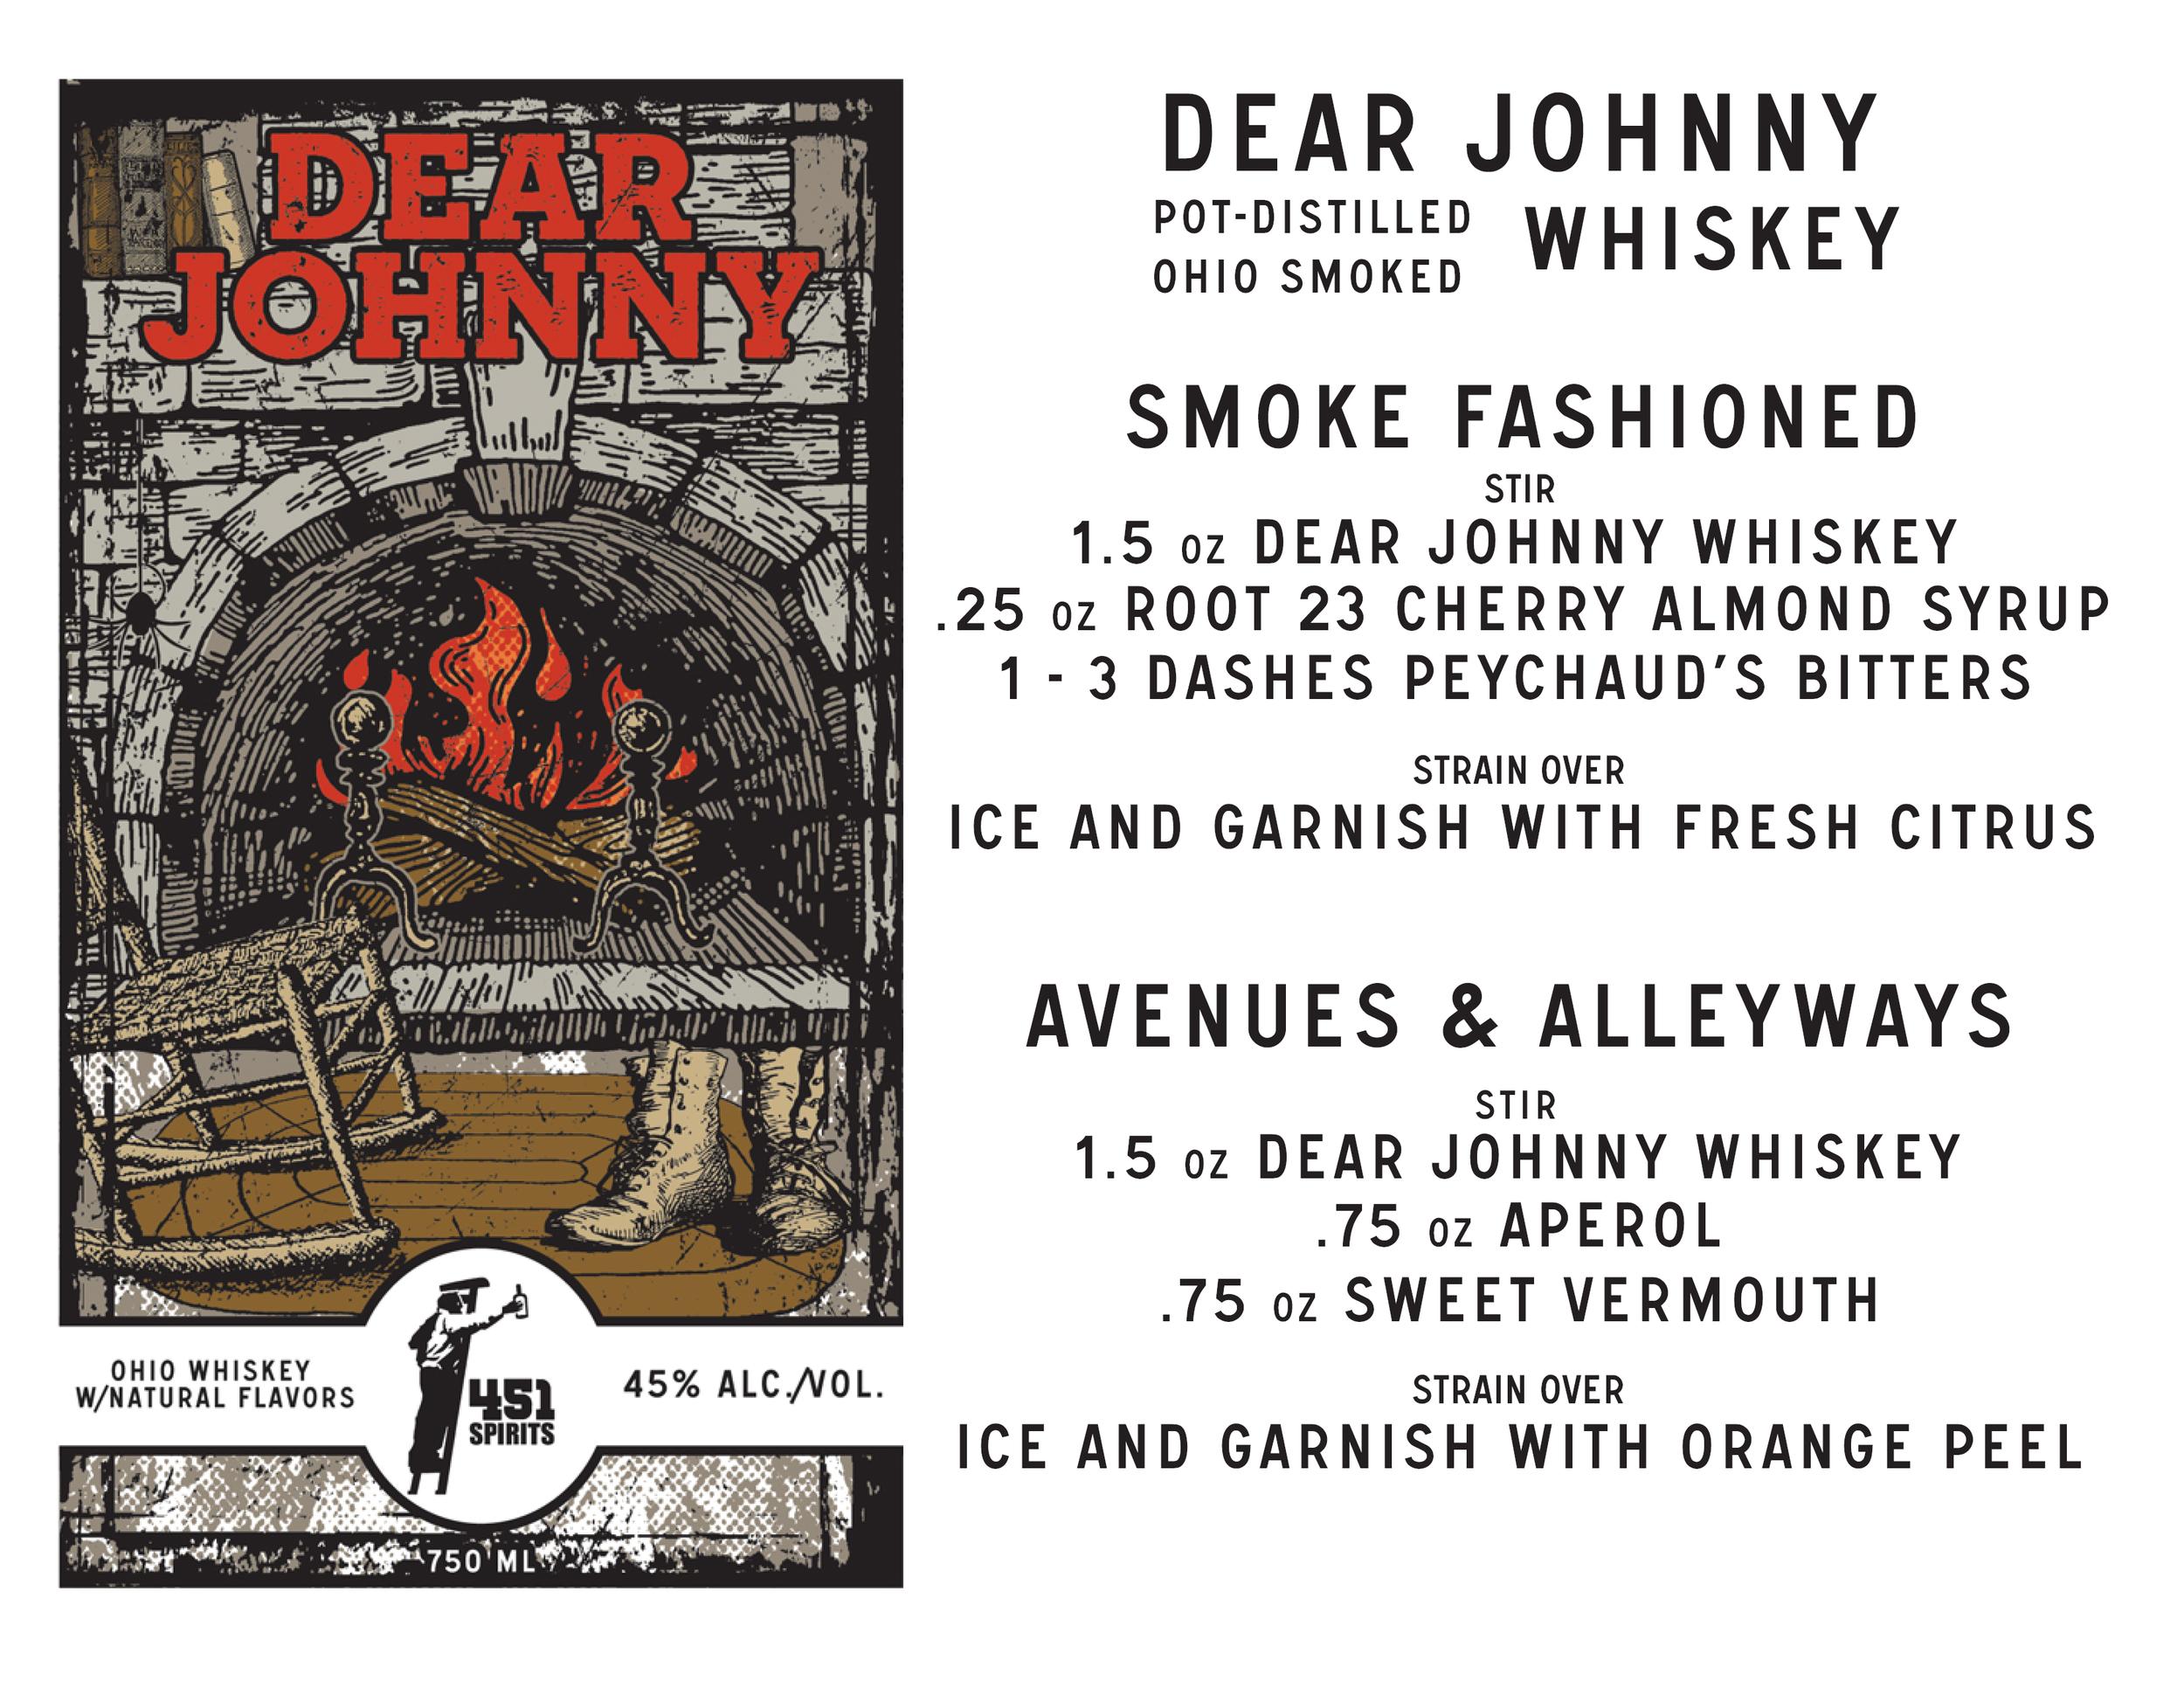 dear_johnny_whiskey_recipes.png